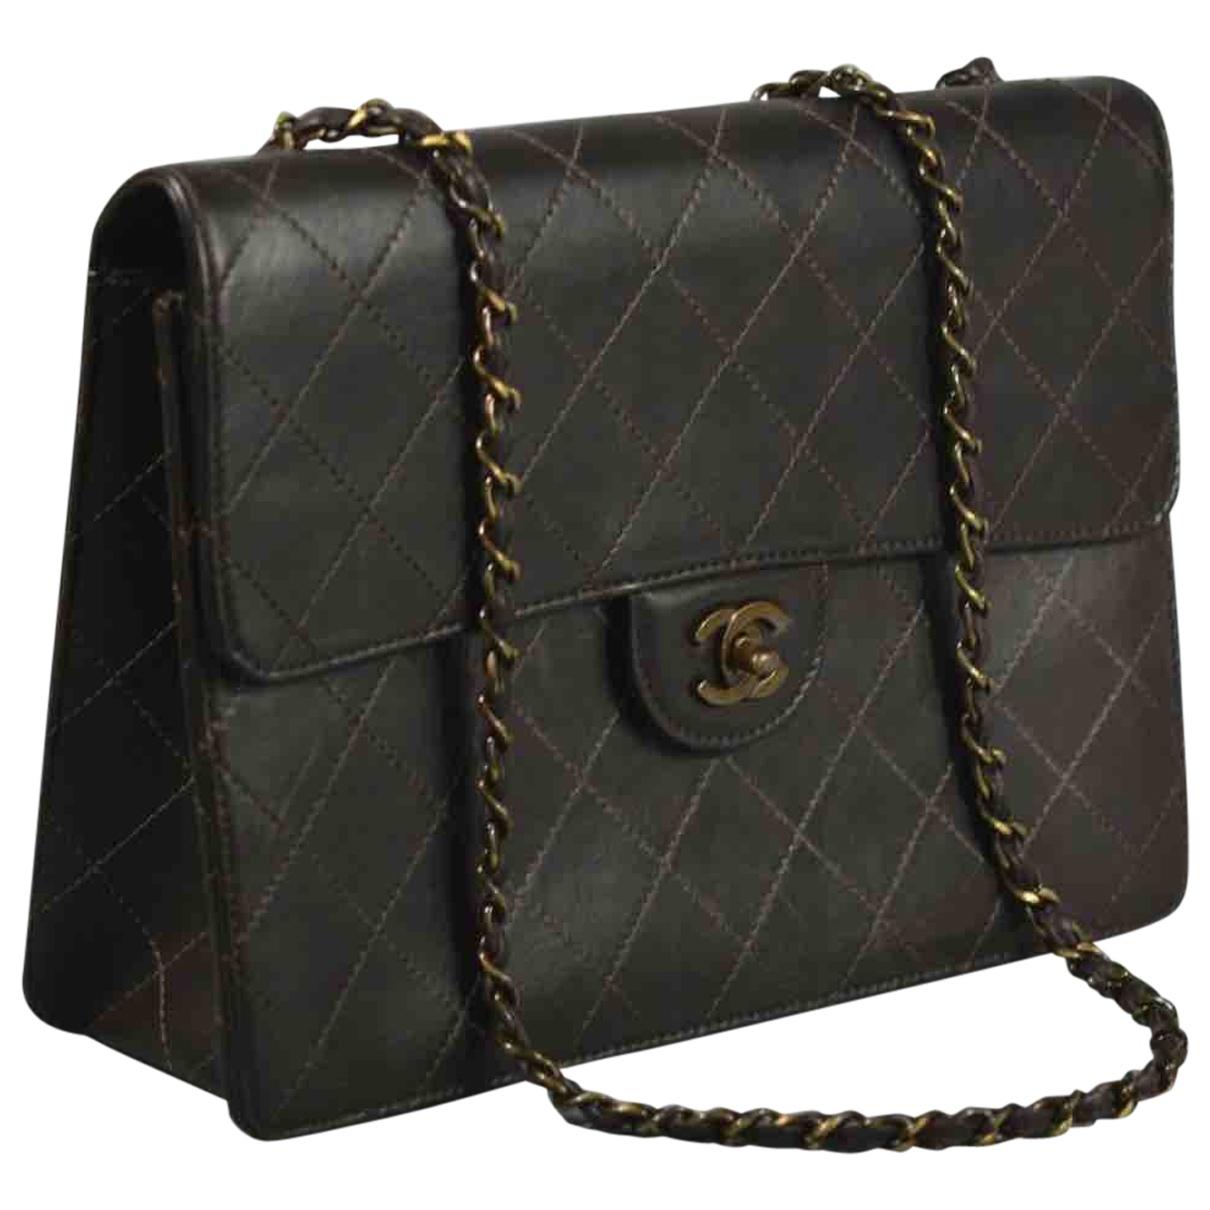 Chanel Timeless/Classique Handtasche in  Braun Leder